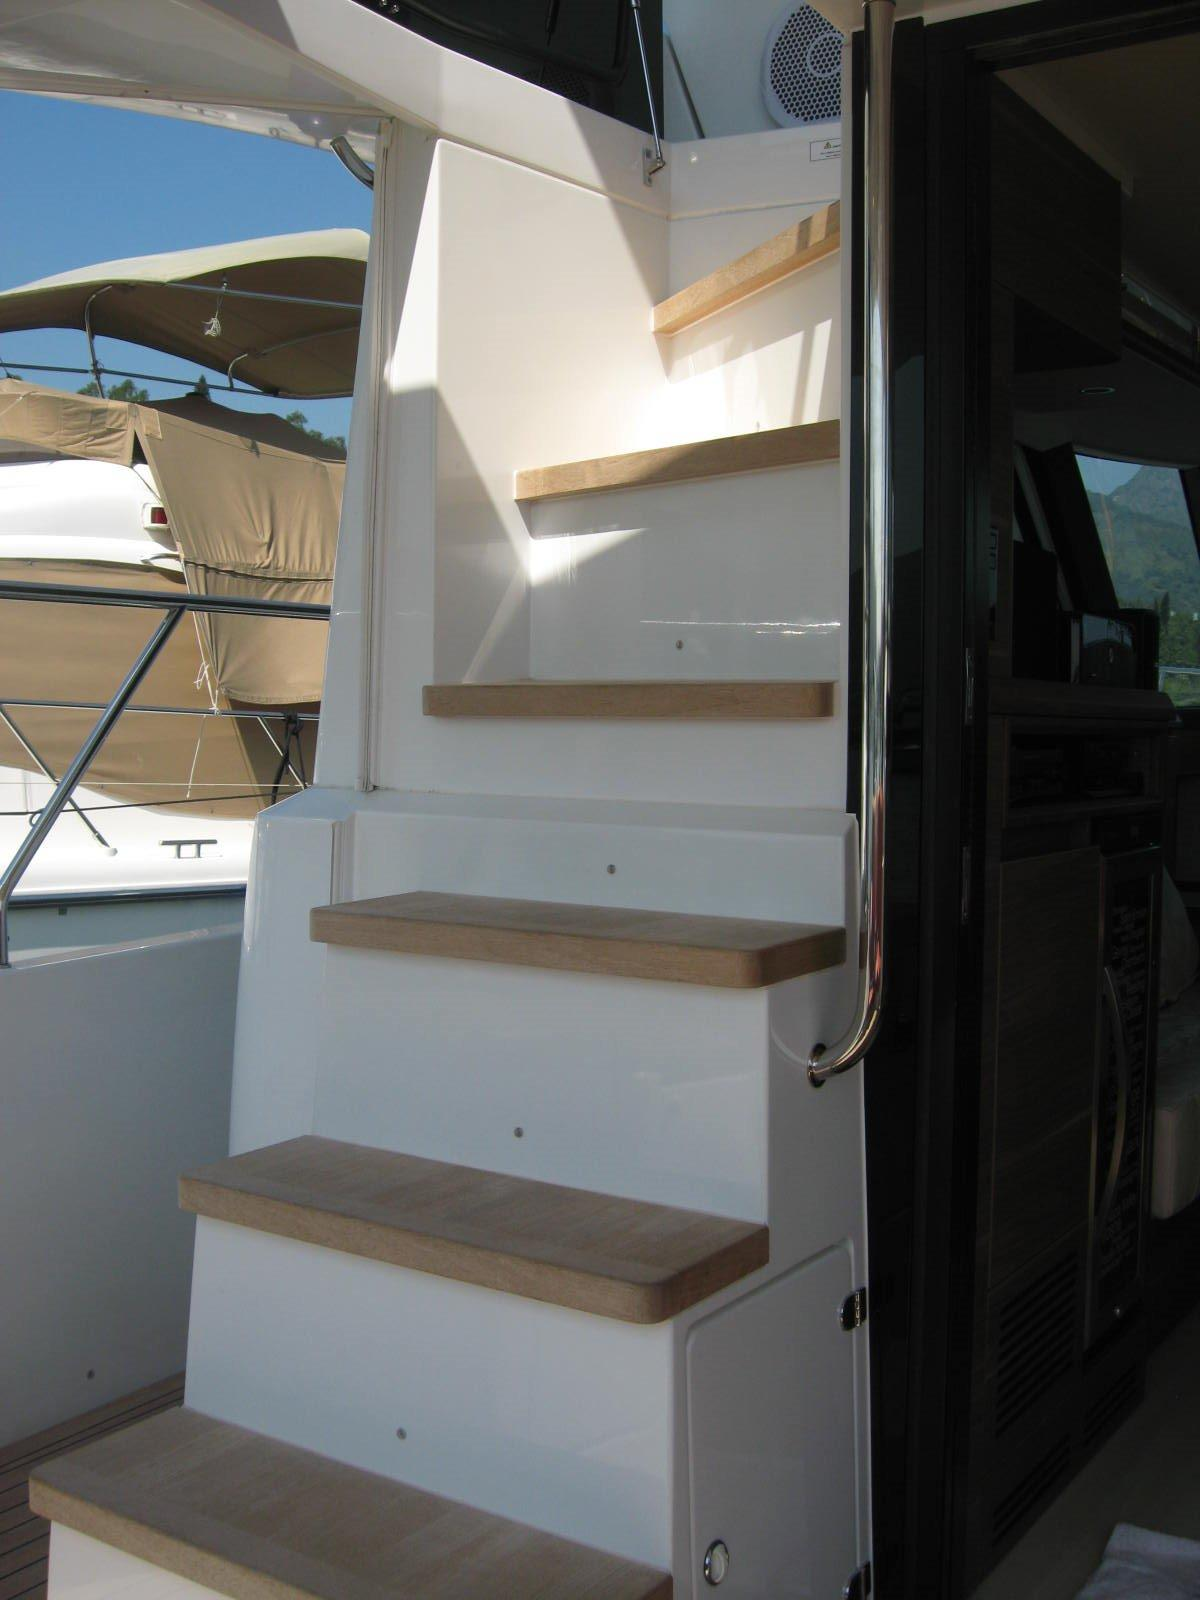 Sealine F450 Flybridge stairs